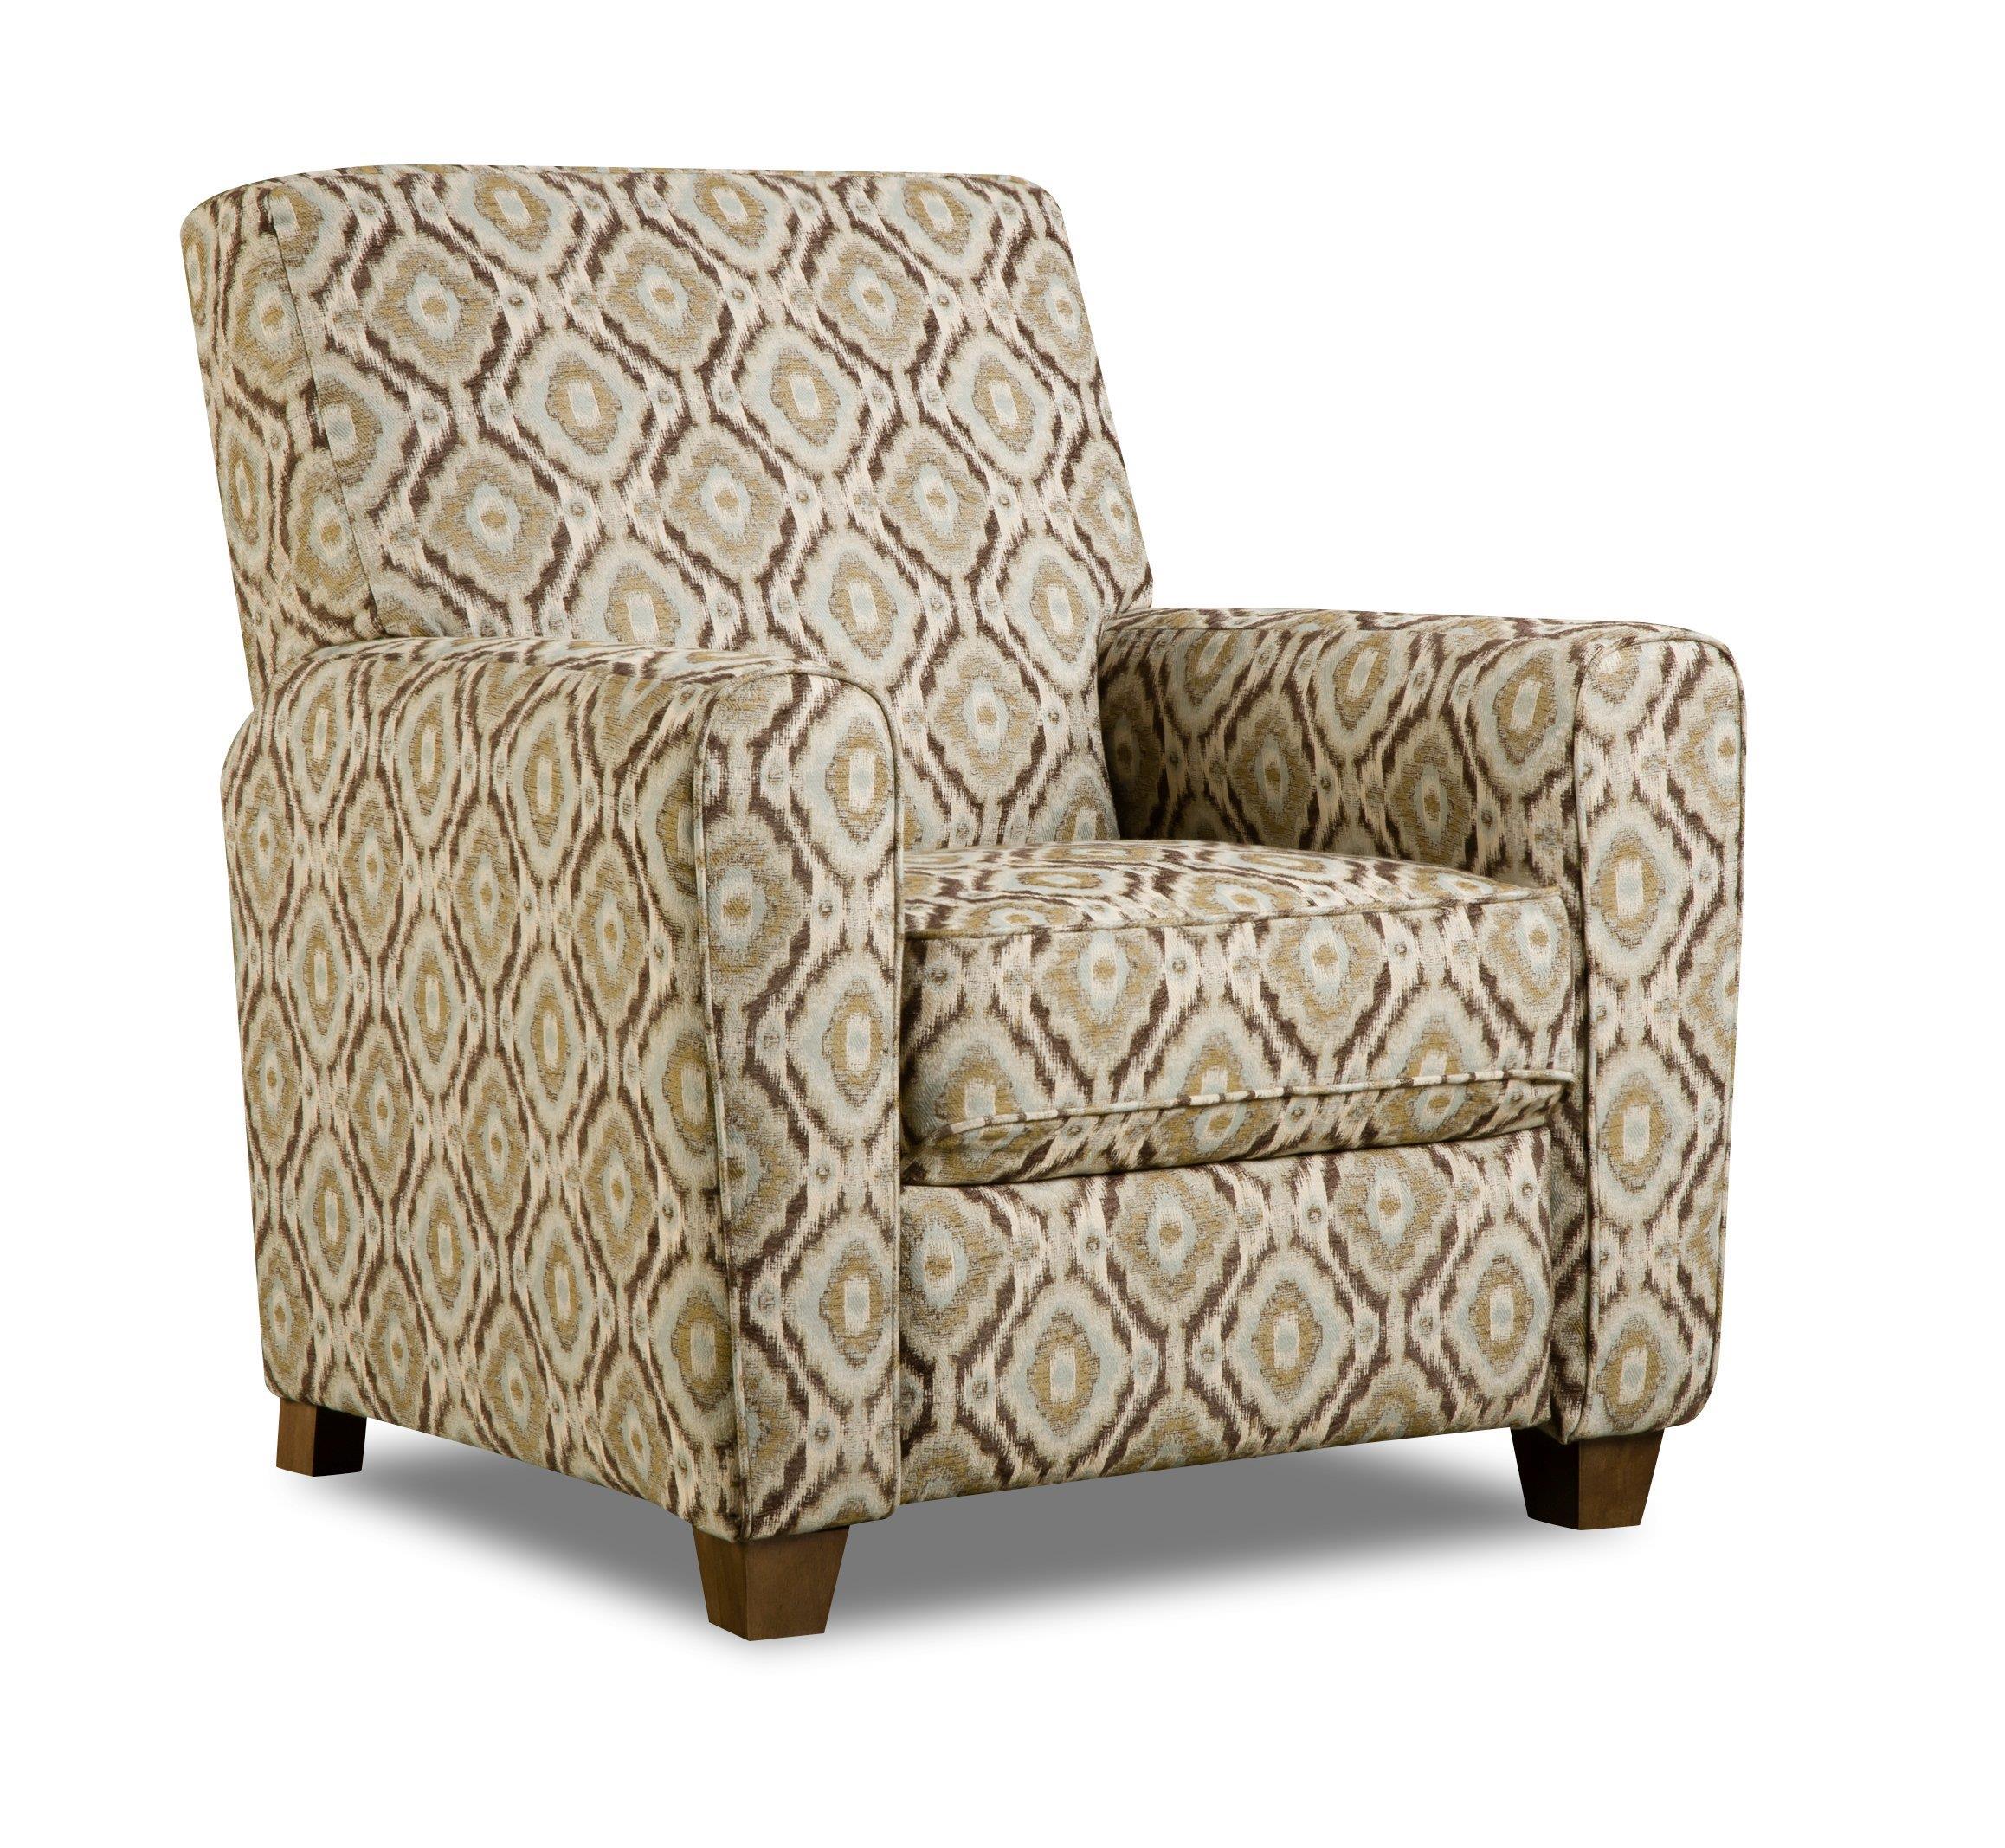 Delicieux American Furniture Recliners Low Leg Retro Accent Recliner